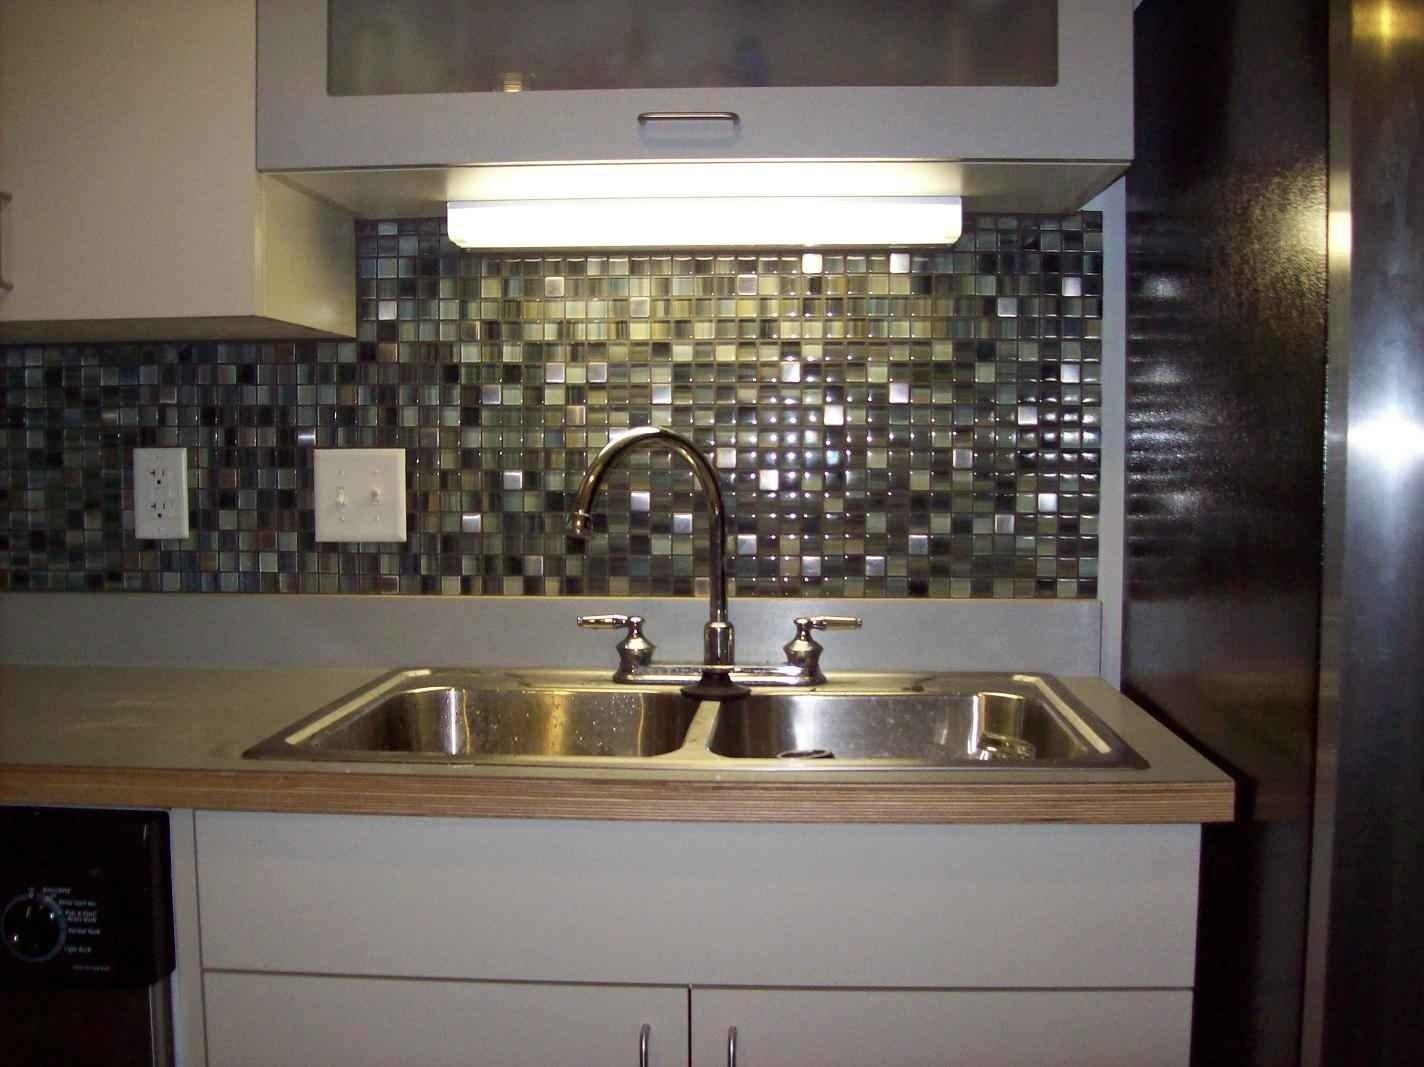 10 Fantastic Backsplash Ideas On A Budget mosaic tile kitchen backsplash ideas on a budget mirorred glass 2021